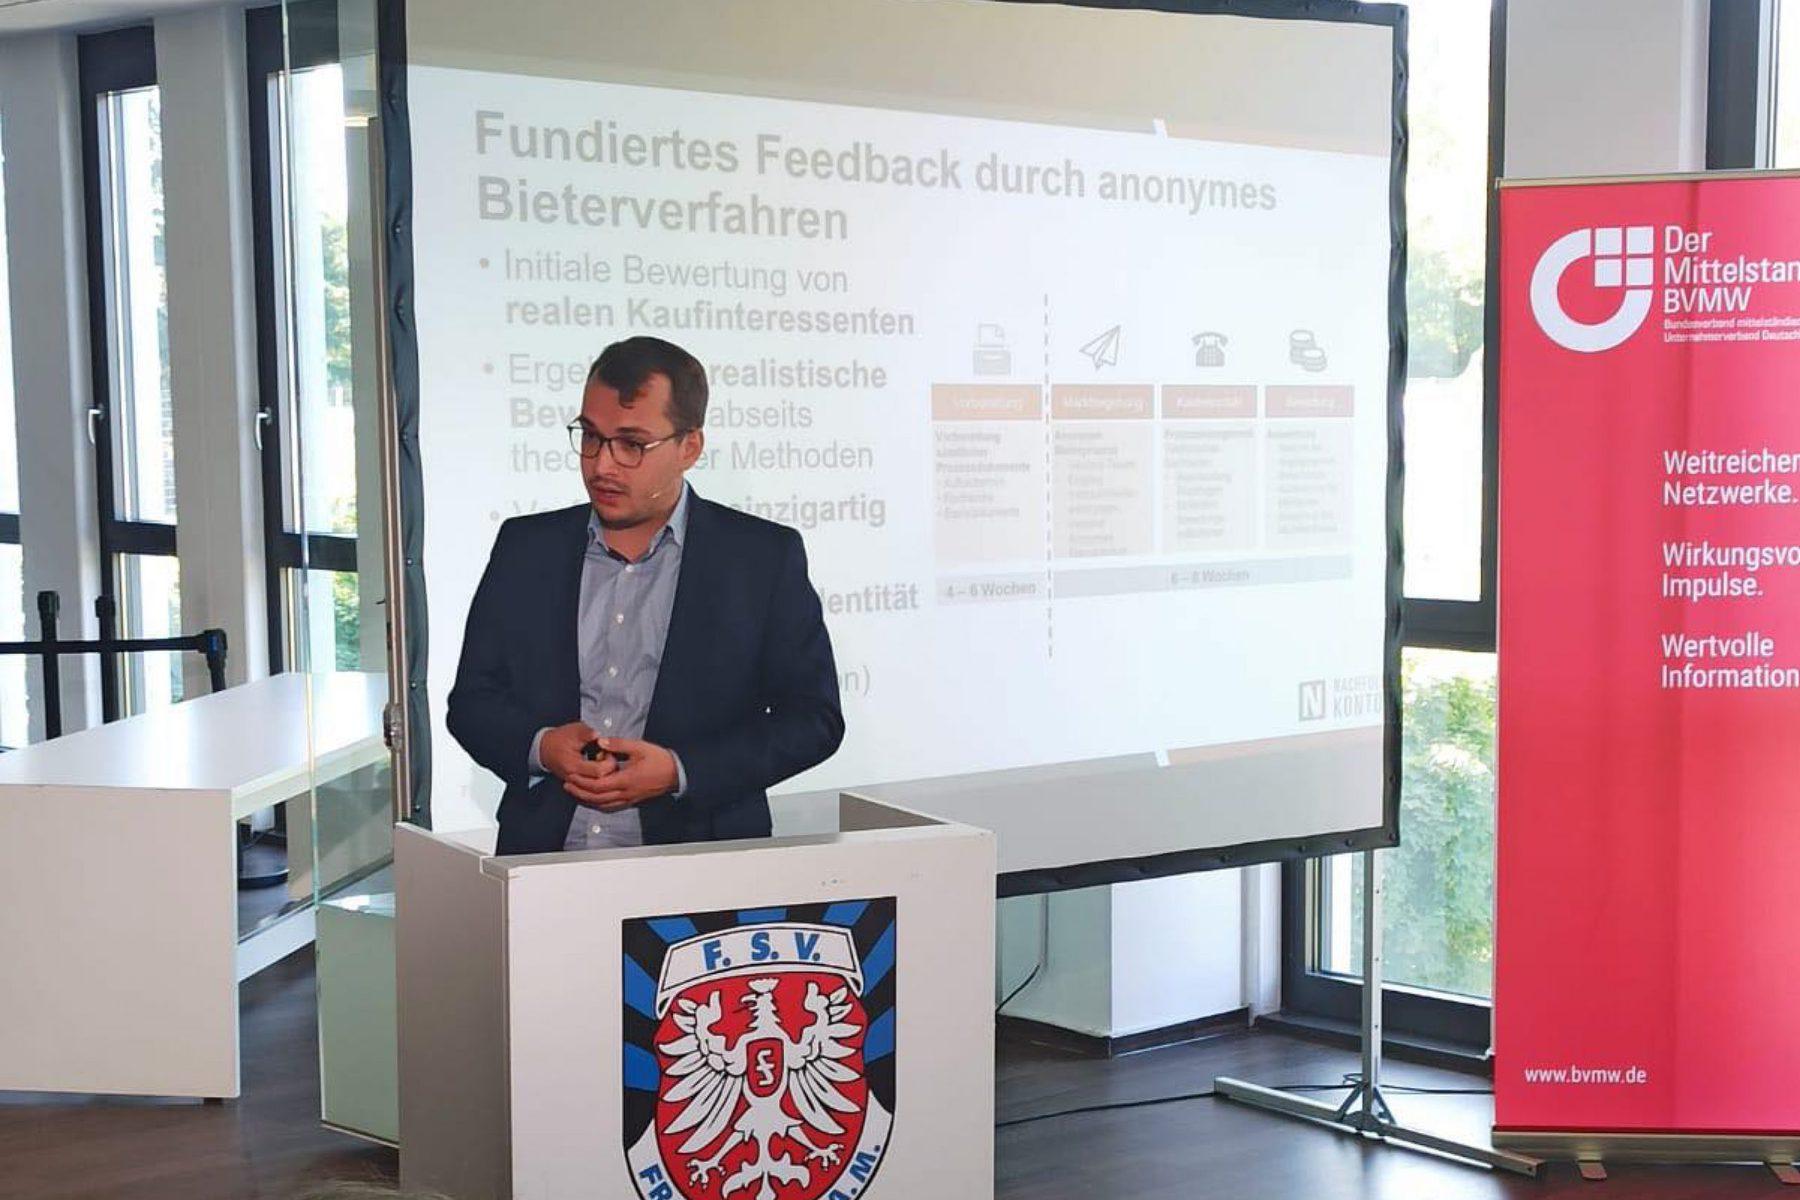 Sebastian Ringleb Vortrag Bvmw